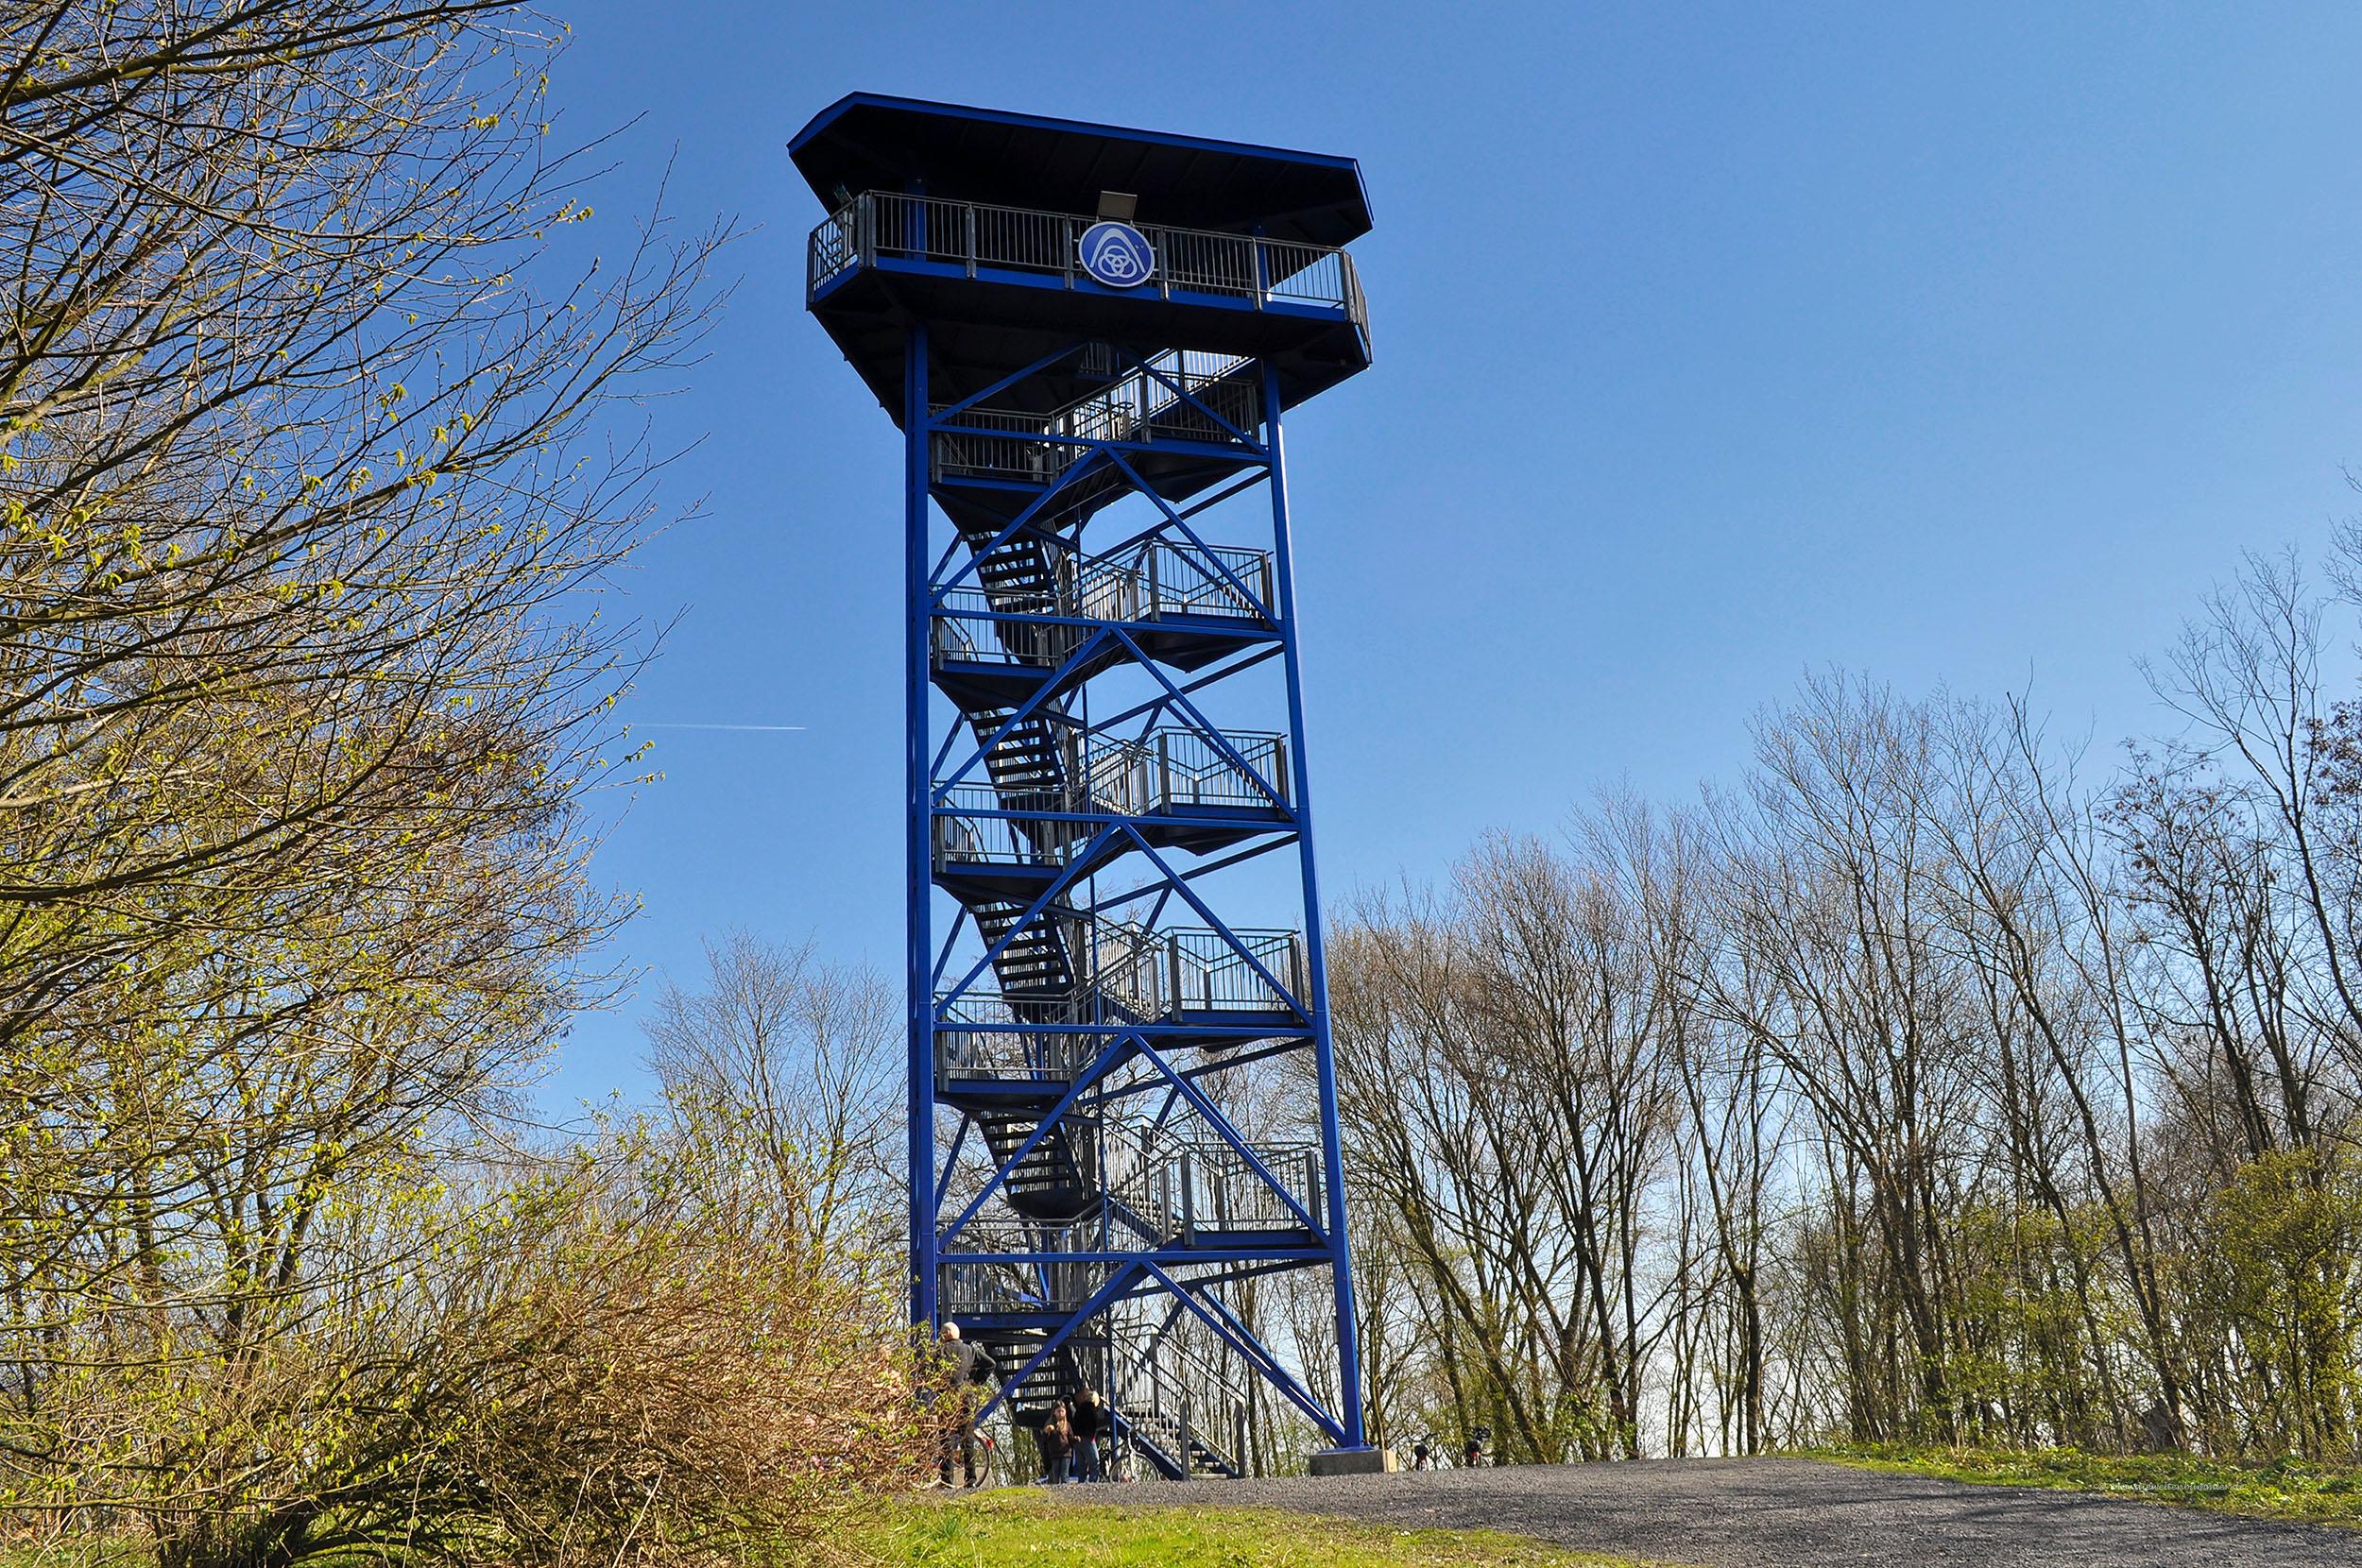 Aussichtsturm auf der Duisburger Seenplatte